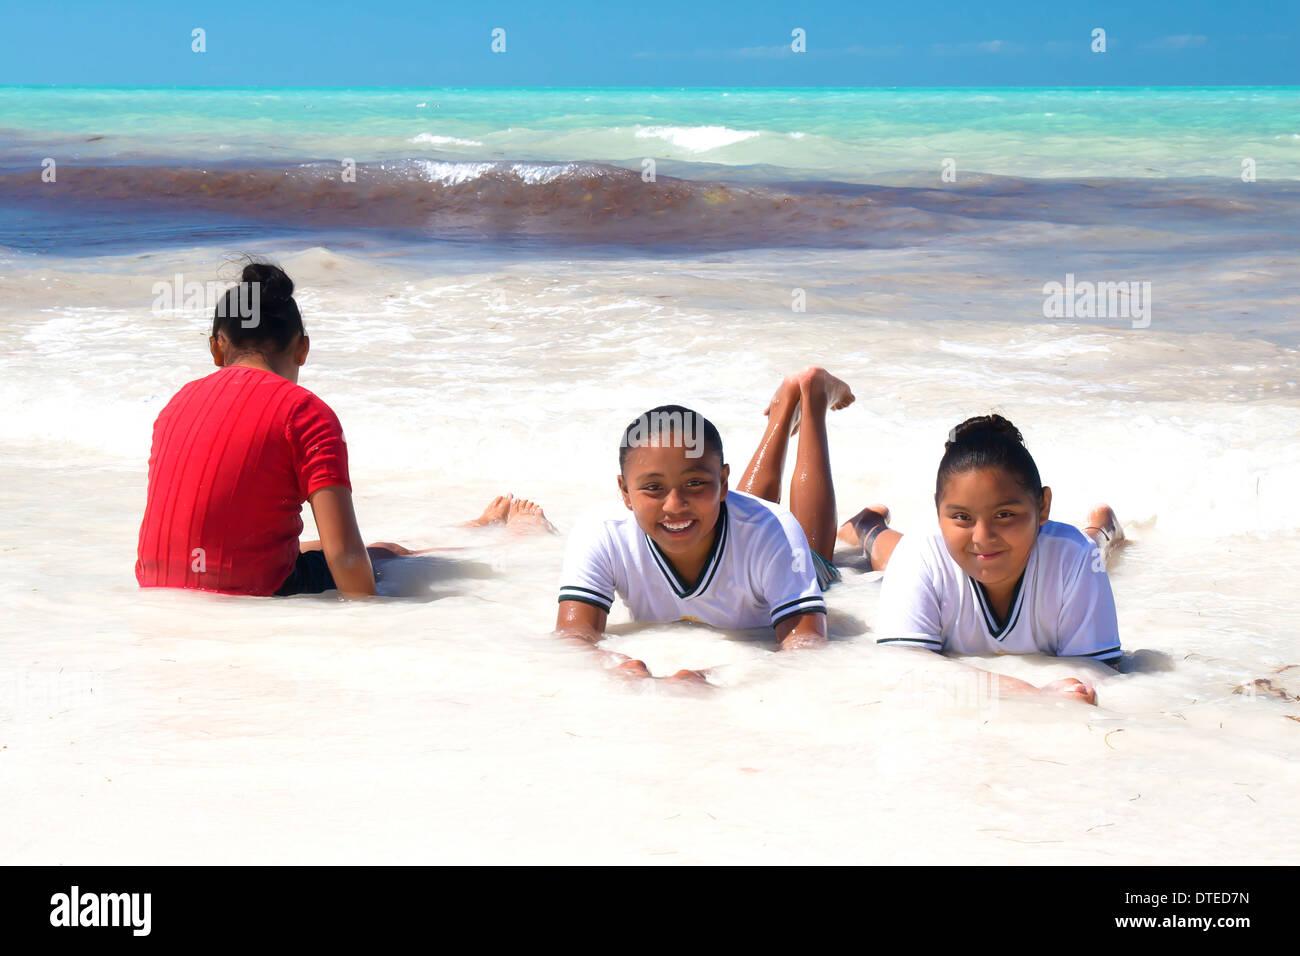 mexican-girls-in-their-school-uniforms-enjoying-the-warm-waters-of-DTED7N.jpg